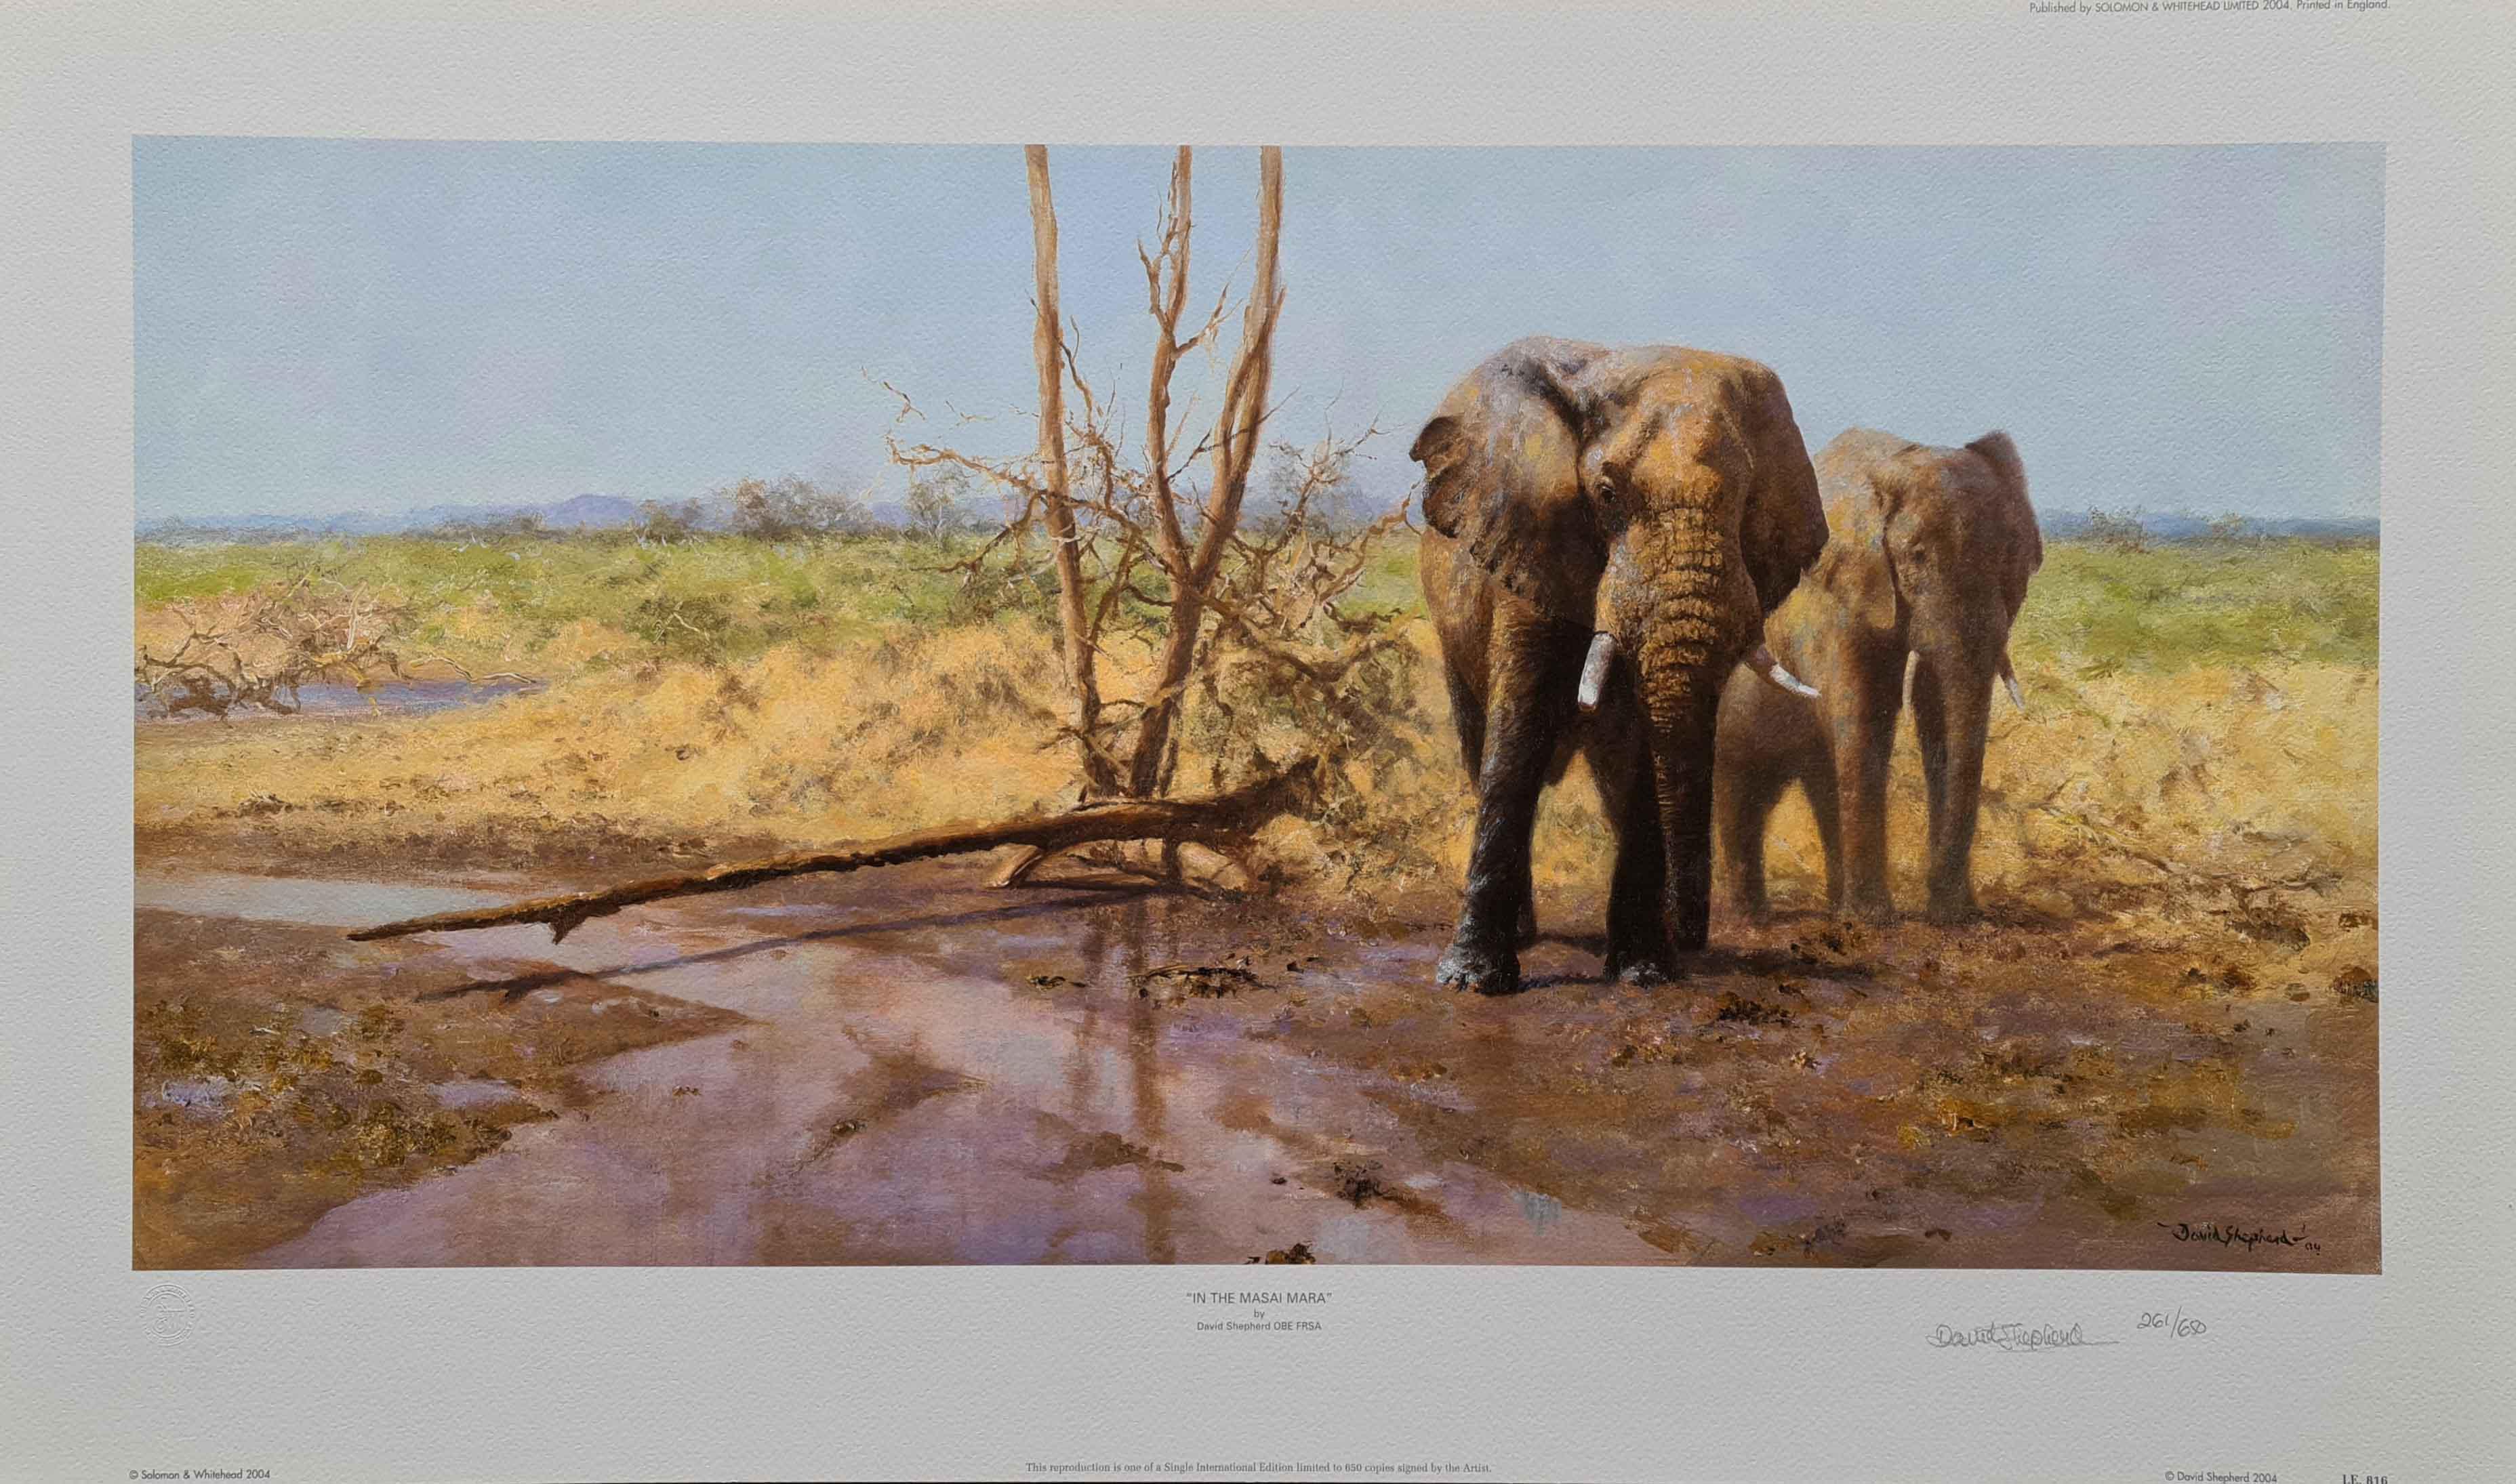 david shepherd, signed limited edition print, in the Masai Mara